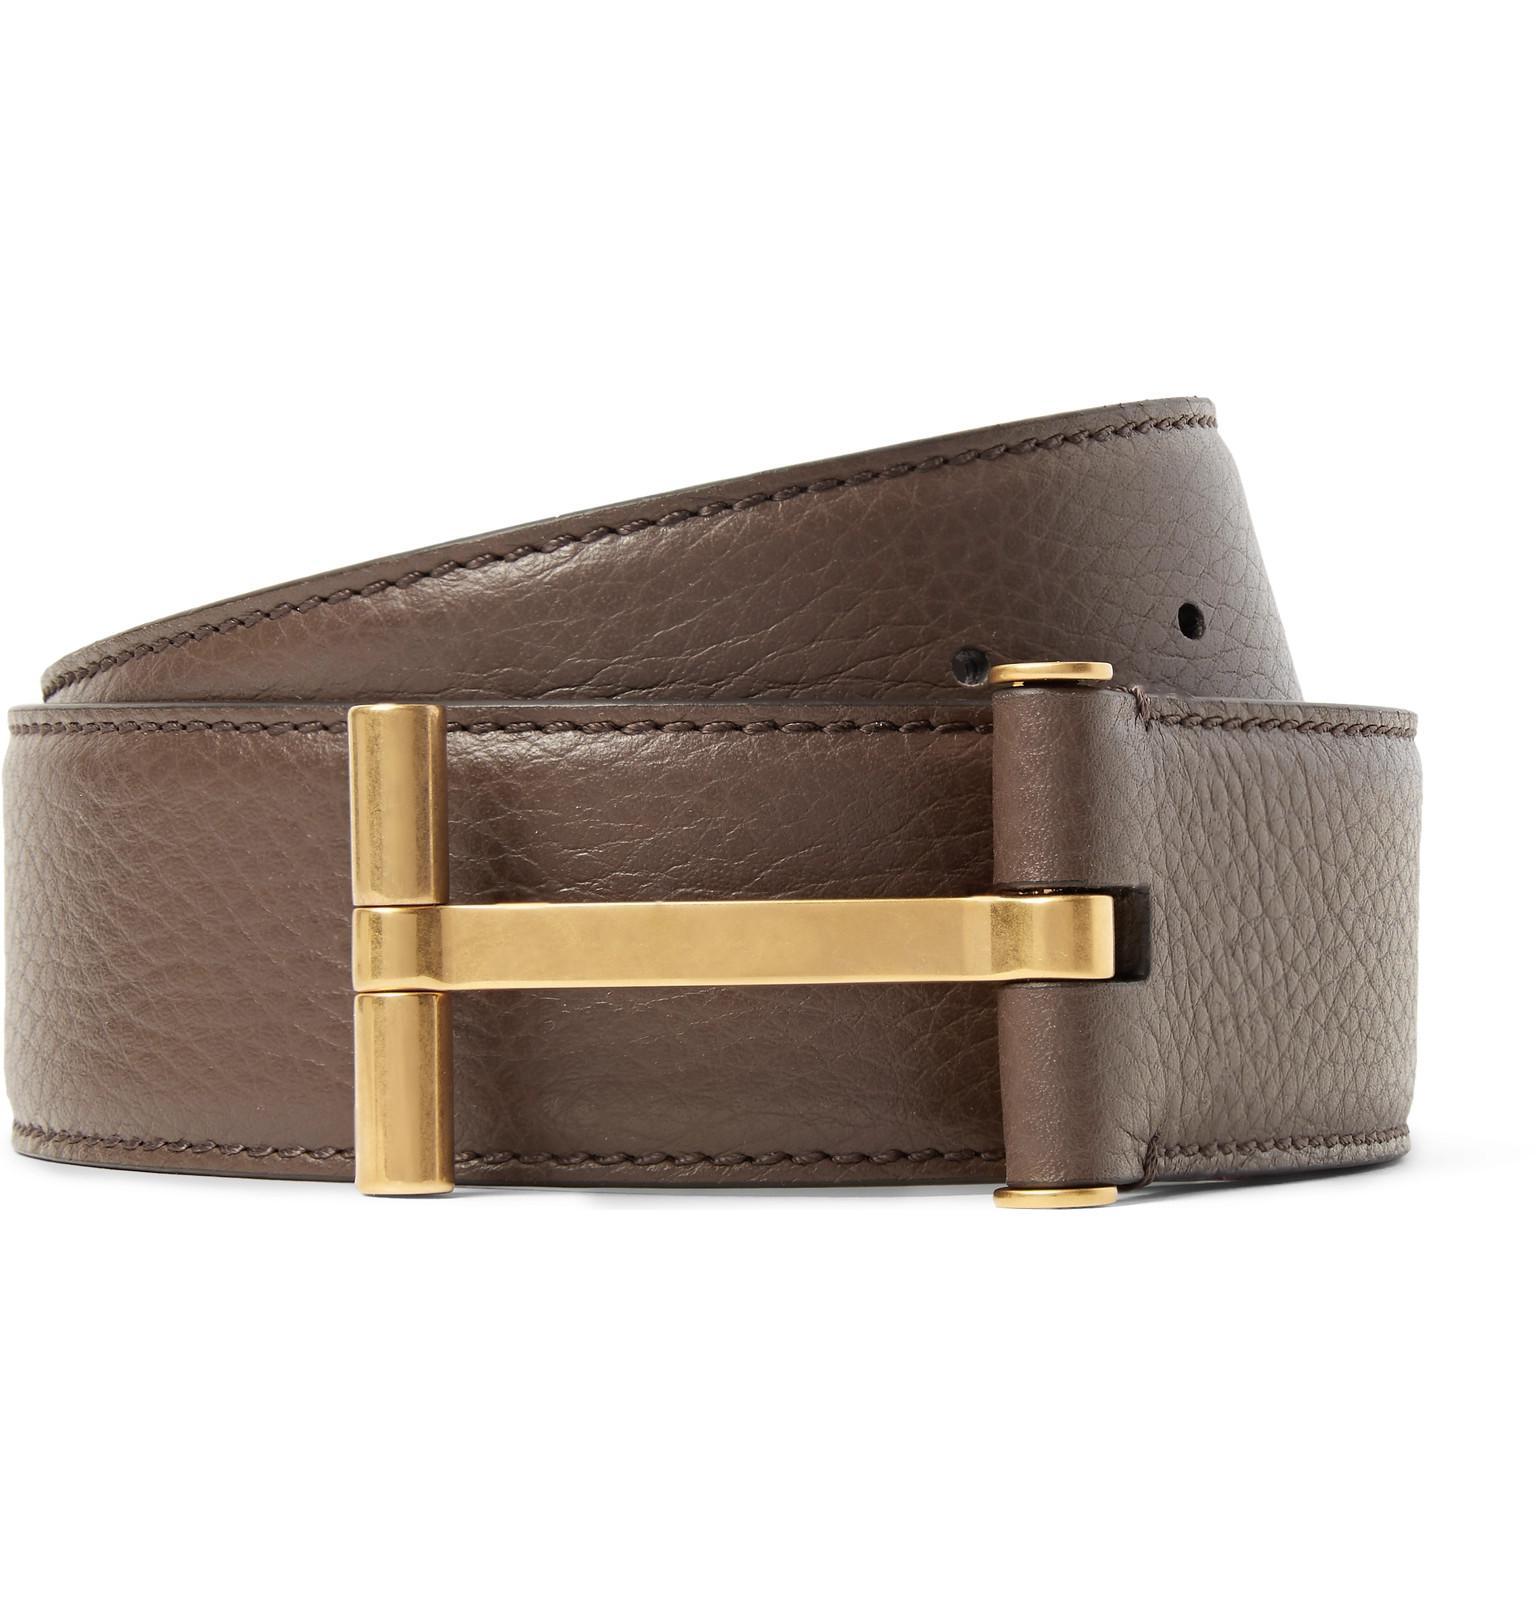 4cm Black And Brown Reversible Full-grain Leather Belt Tom Ford JLRrcR